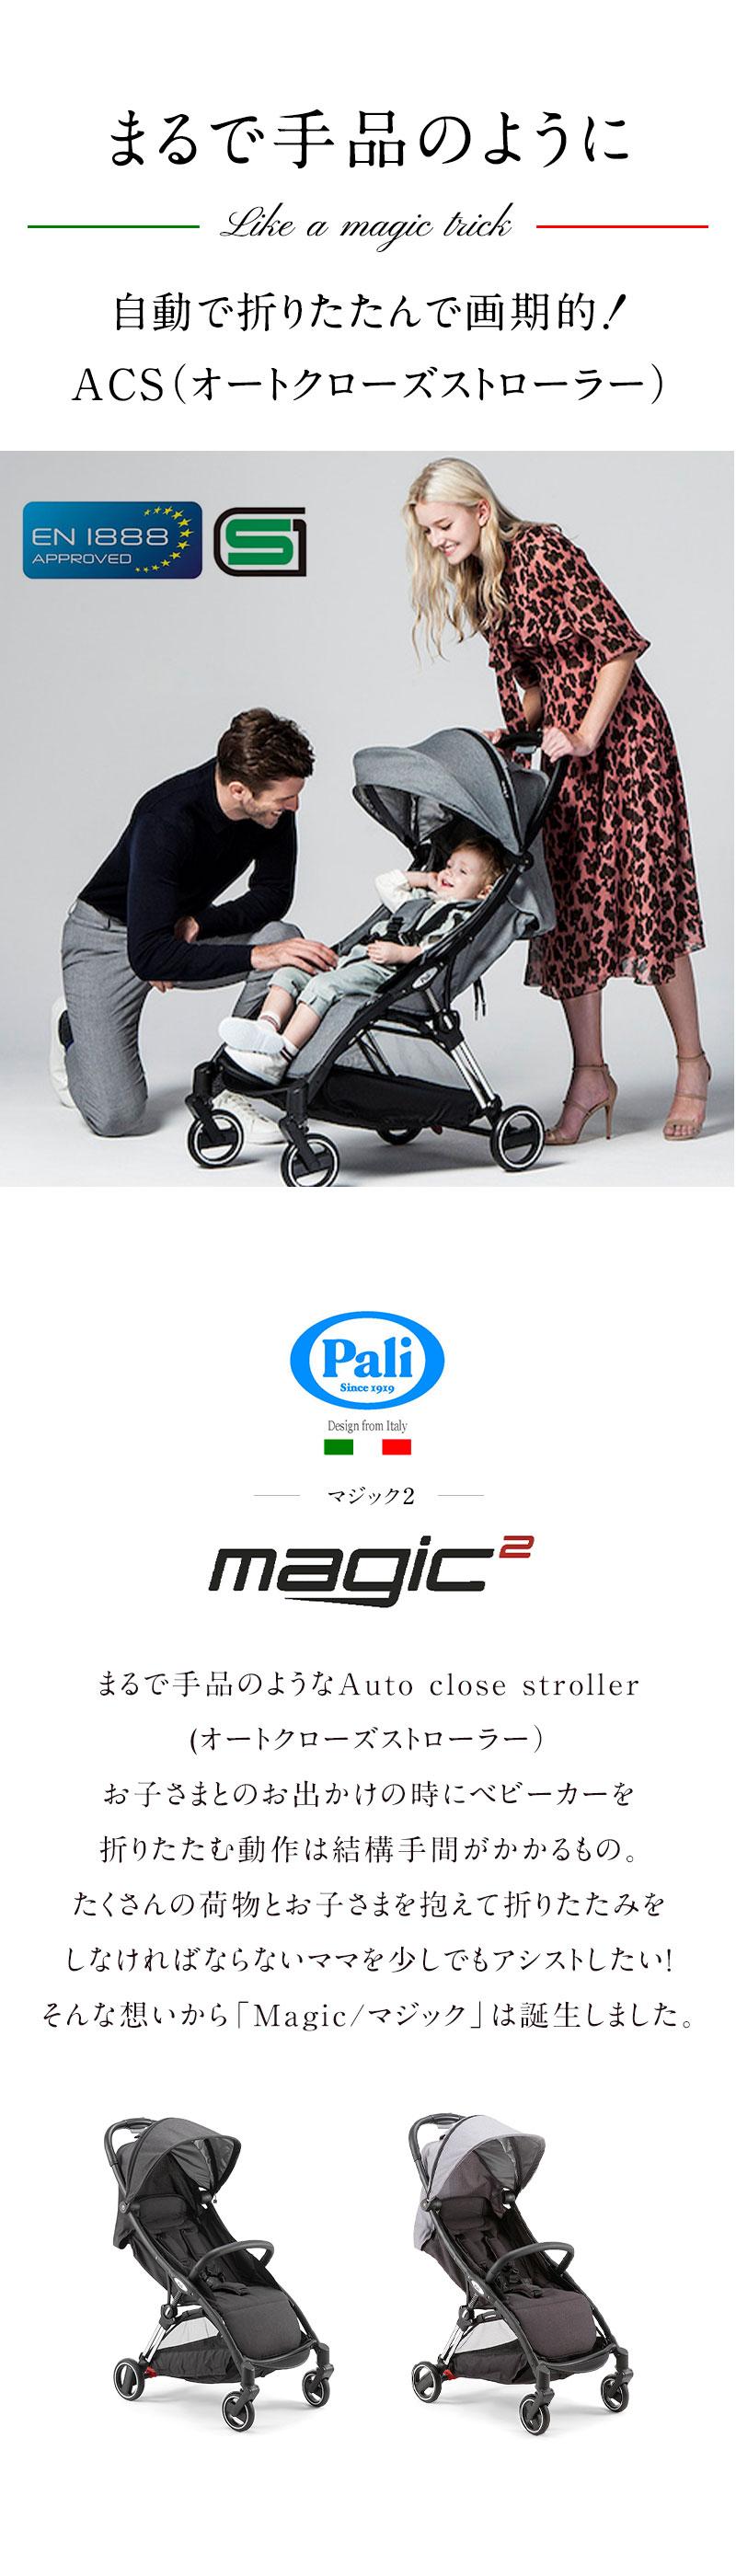 A型ベビーカー!Pali(パーリ)の 【Magic】マジック